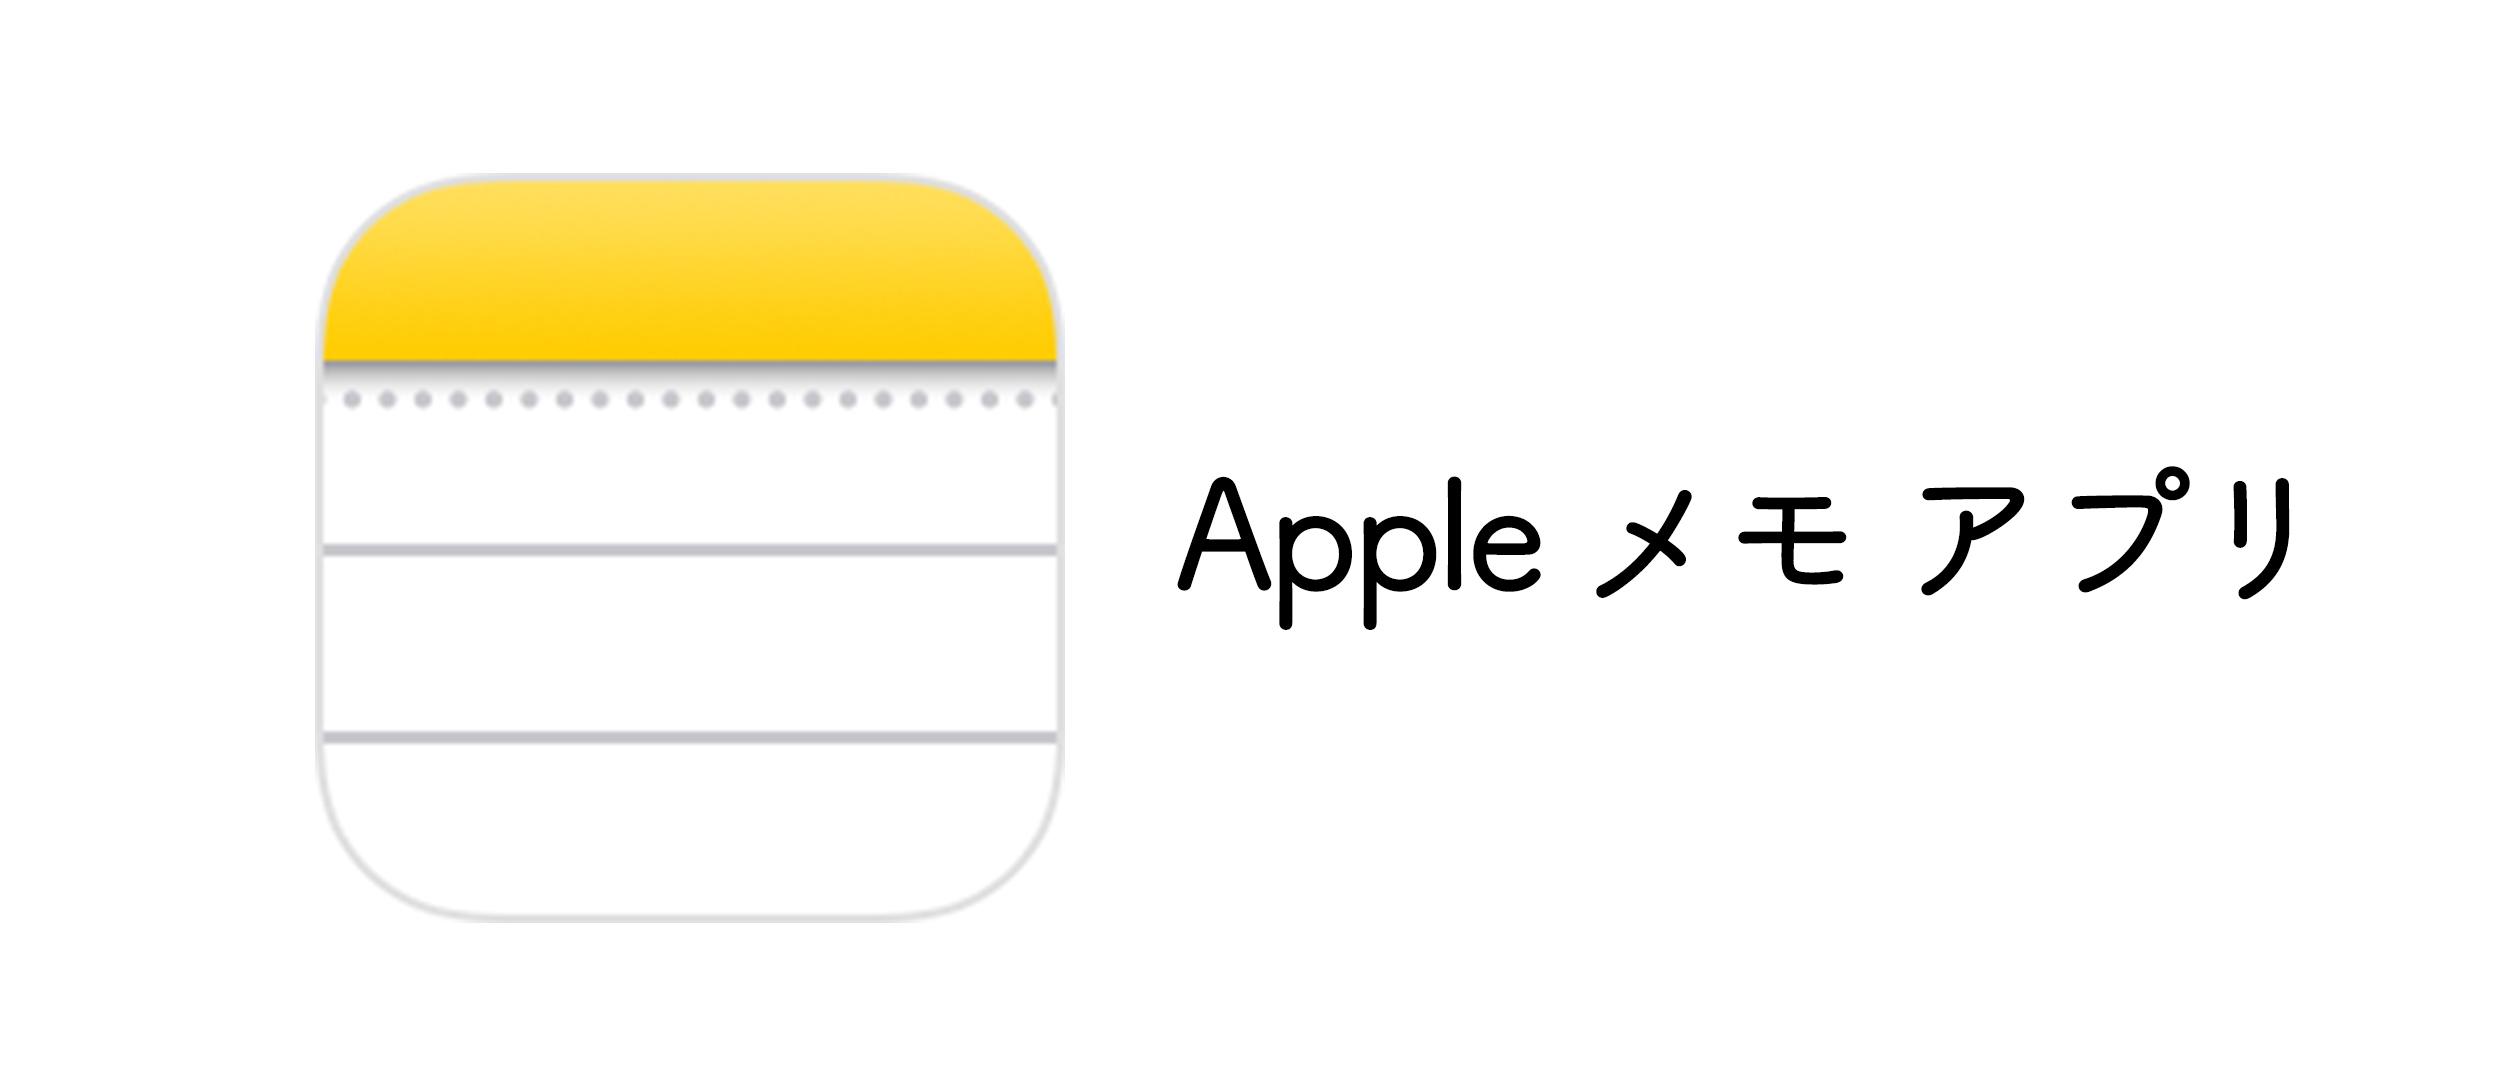 Apple メモアプリの画像